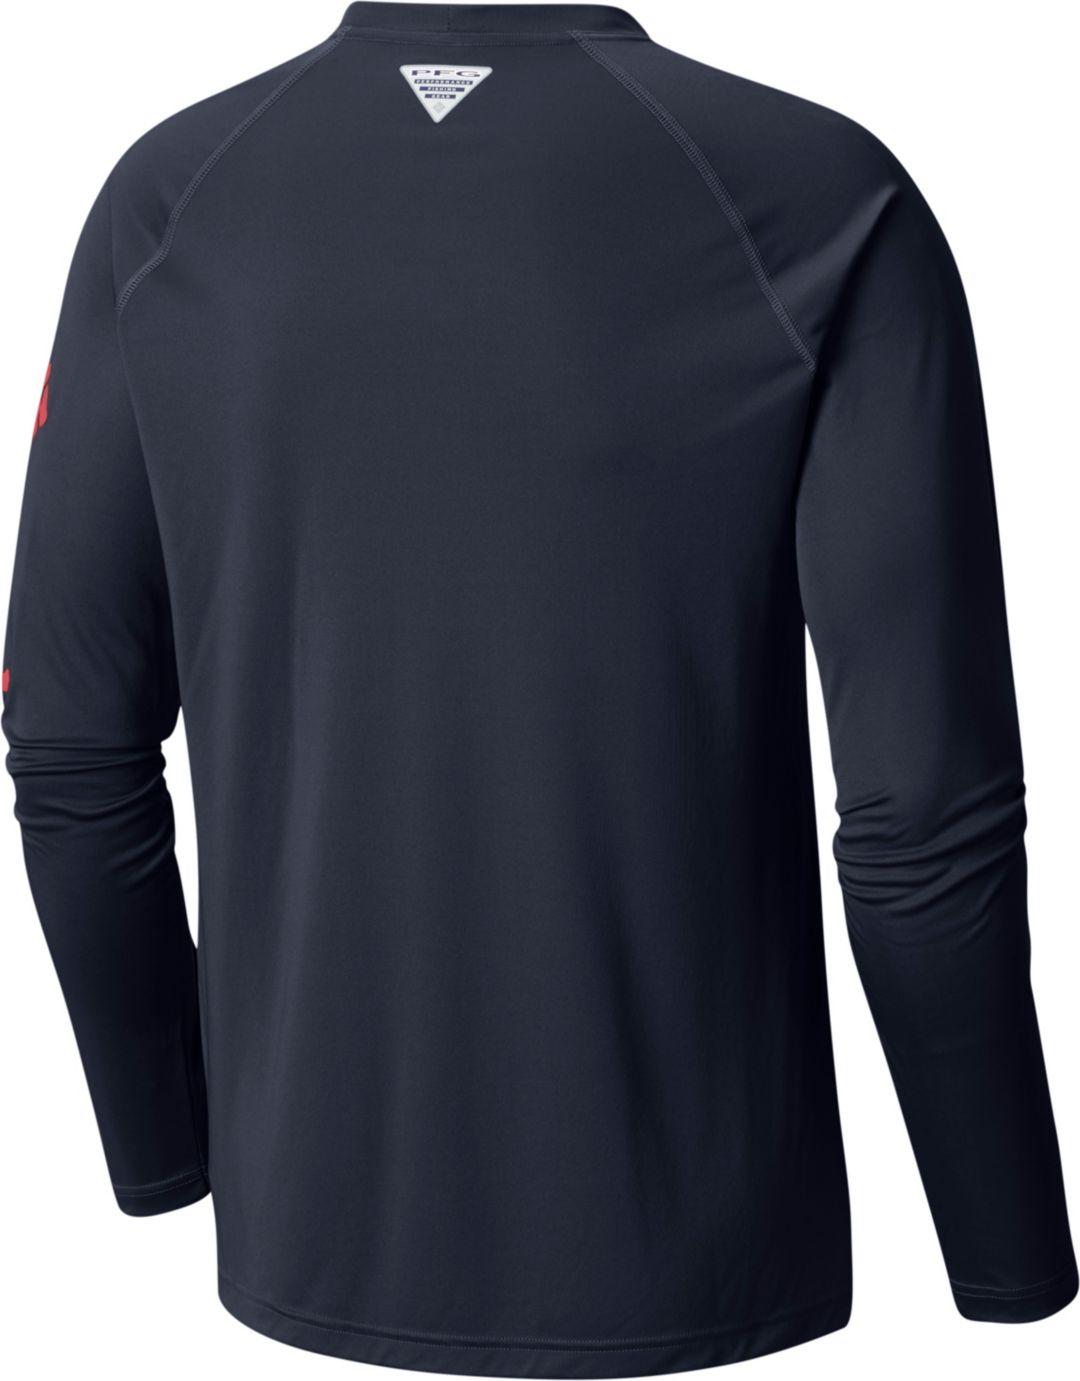 2dba4906 Columbia Men's PFG Terminal Tackle Long Sleeve Shirt. noImageFound.  Previous. 1. 2